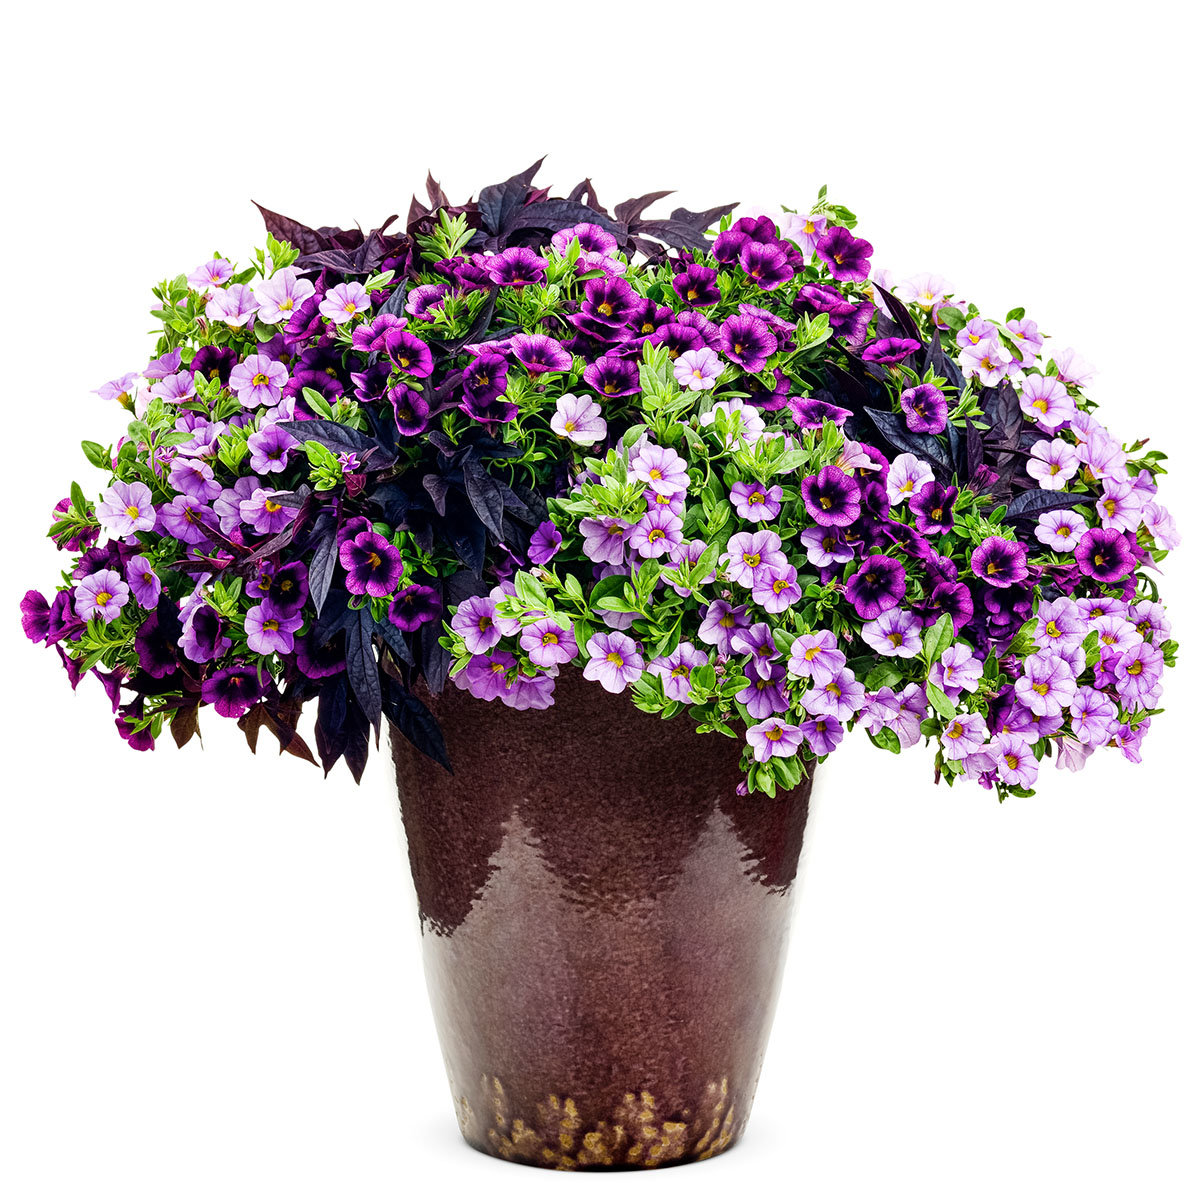 Mini-Jungpflanzen Beet- und Kübel Sortiment Purple Rain